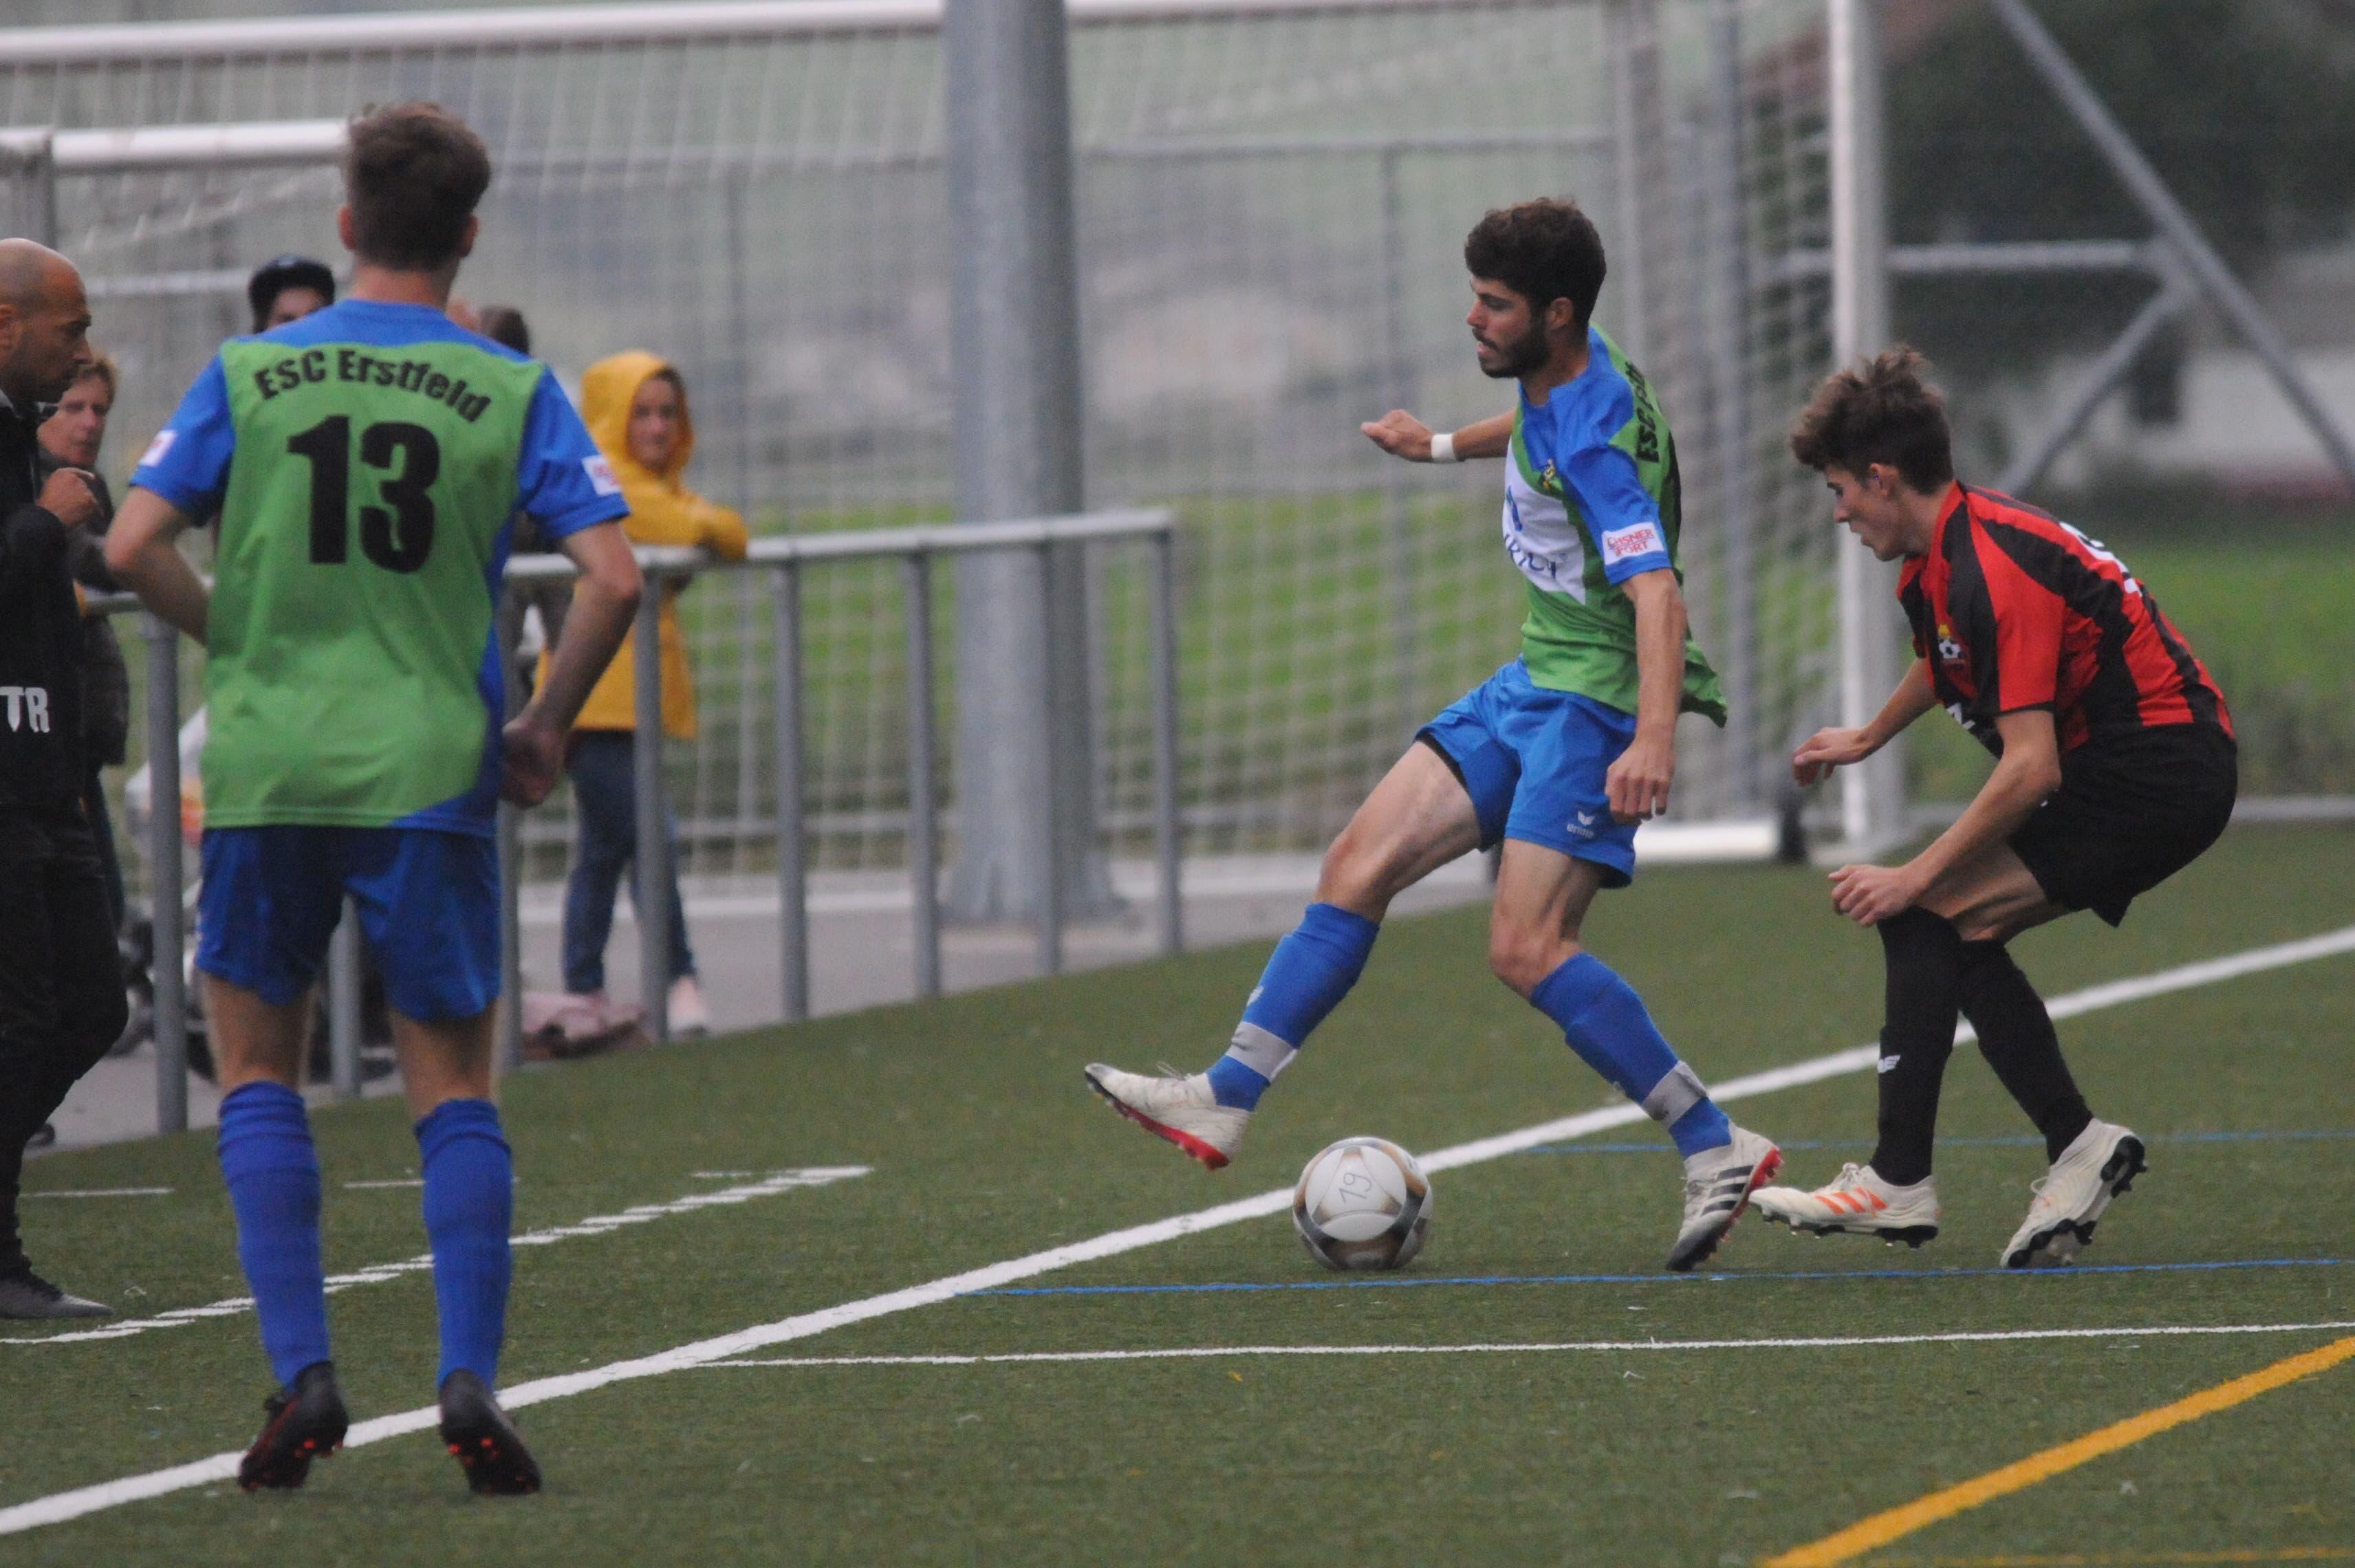 ESC-Spieler Janick Gisler am Ball